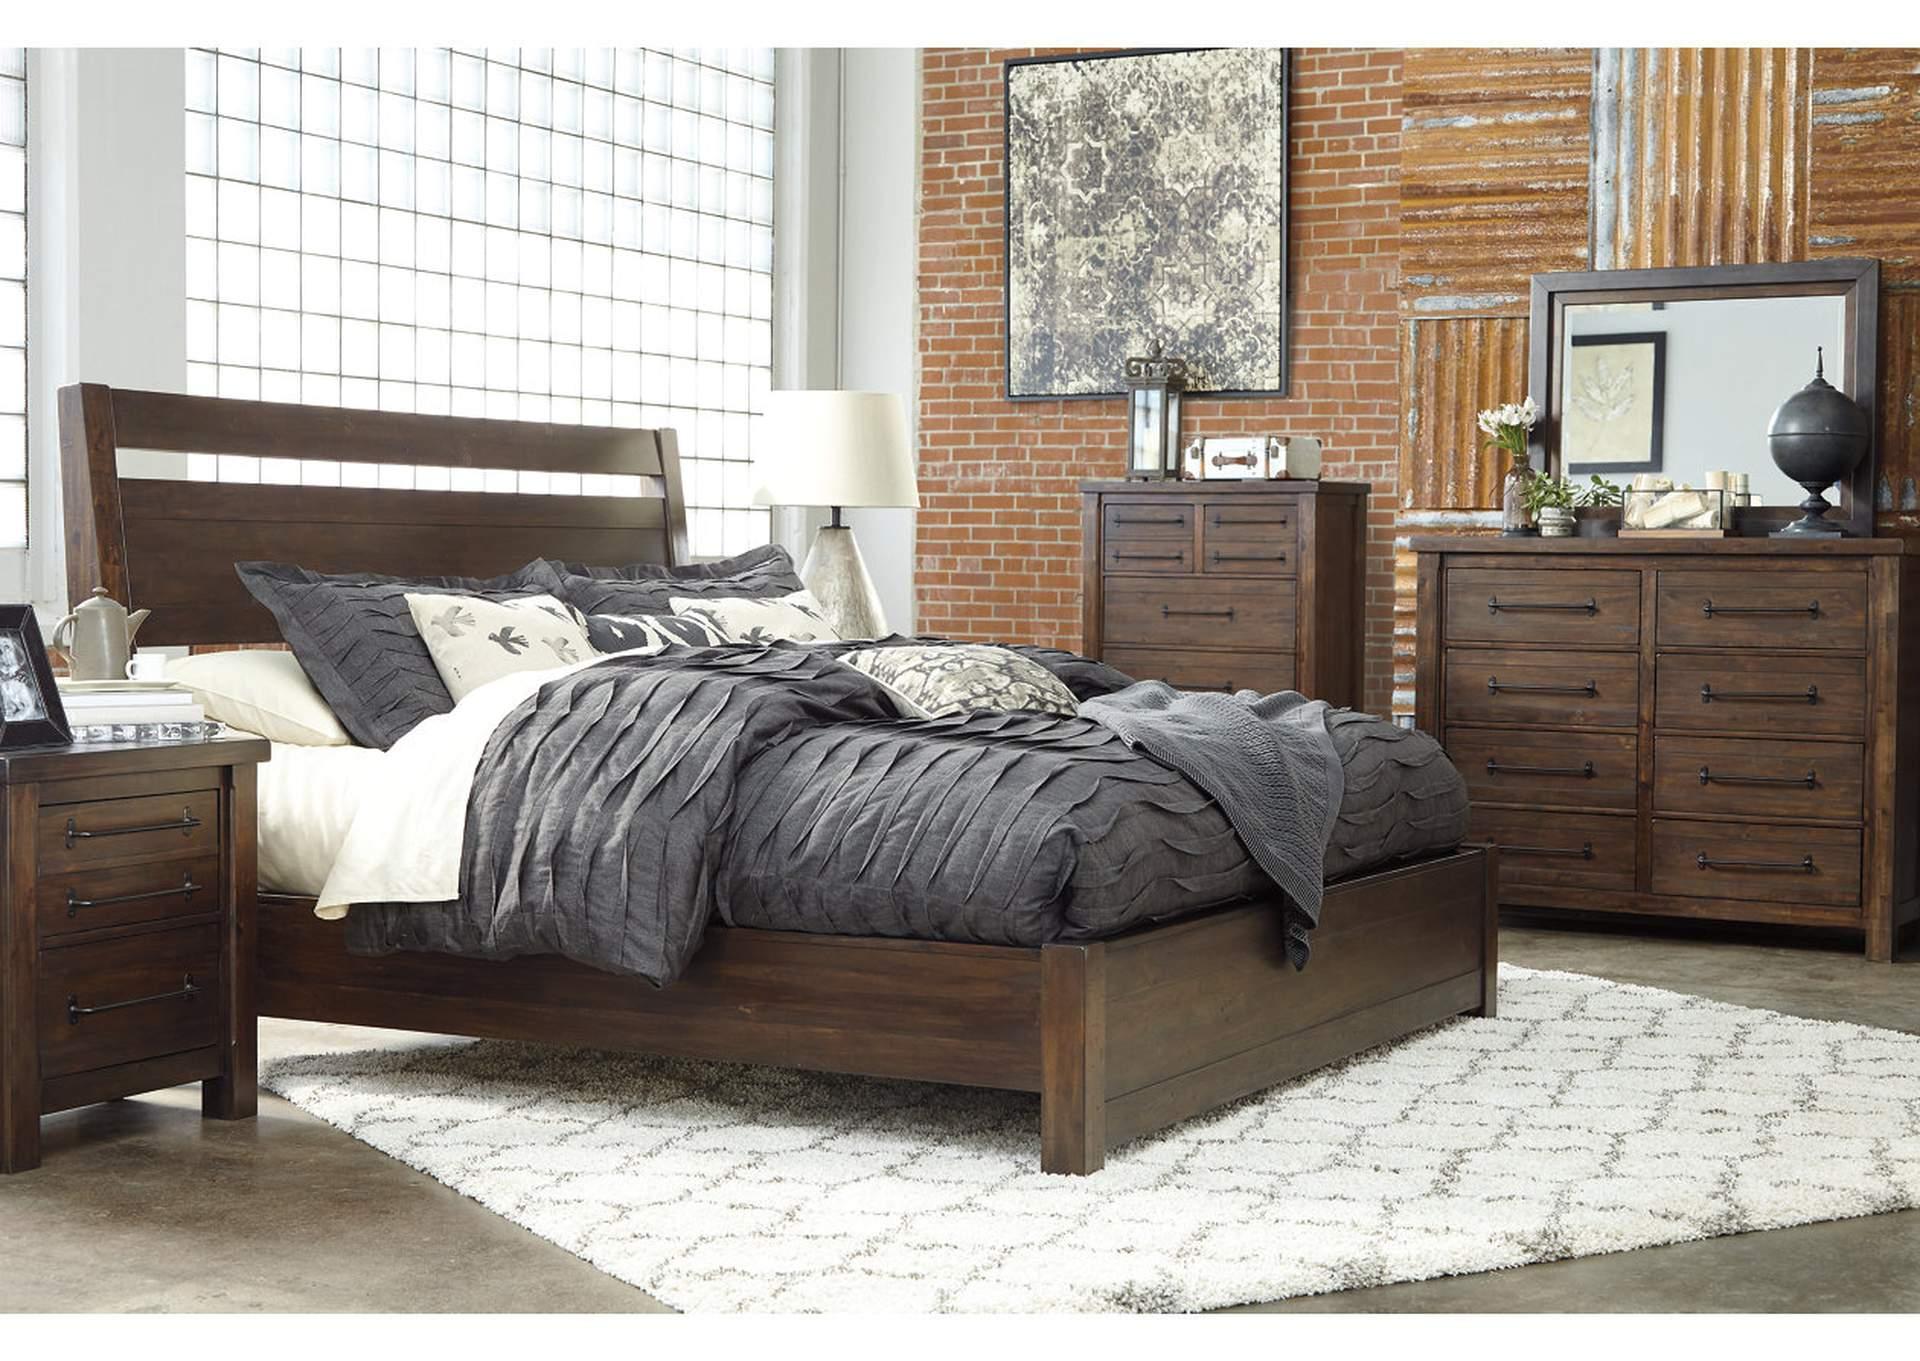 Starmore King Platform Bed w/Dresser and Mirror   PEDIDO ESPECIAL